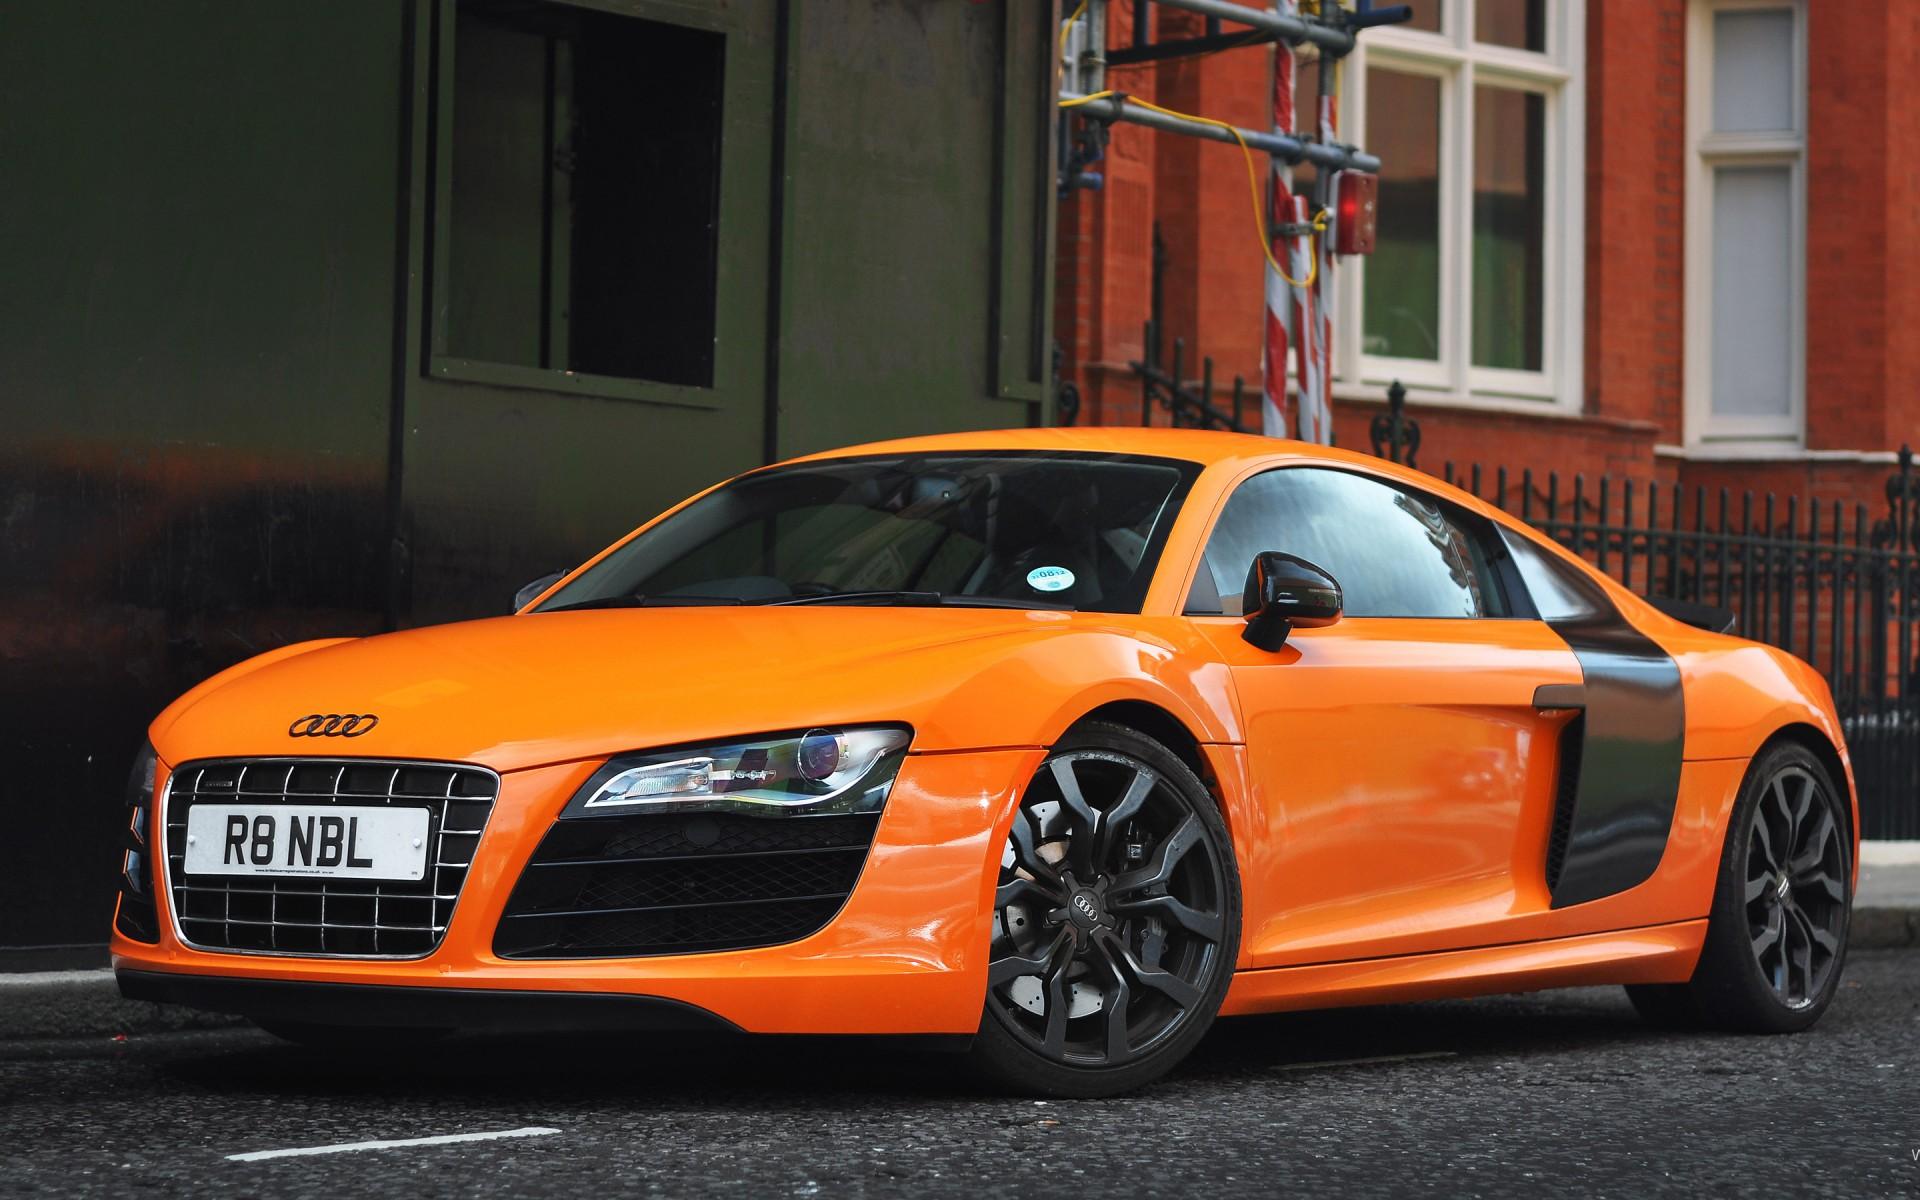 Orange Audi R8 Wallpaper Hd Car Wallpapers Id 2978